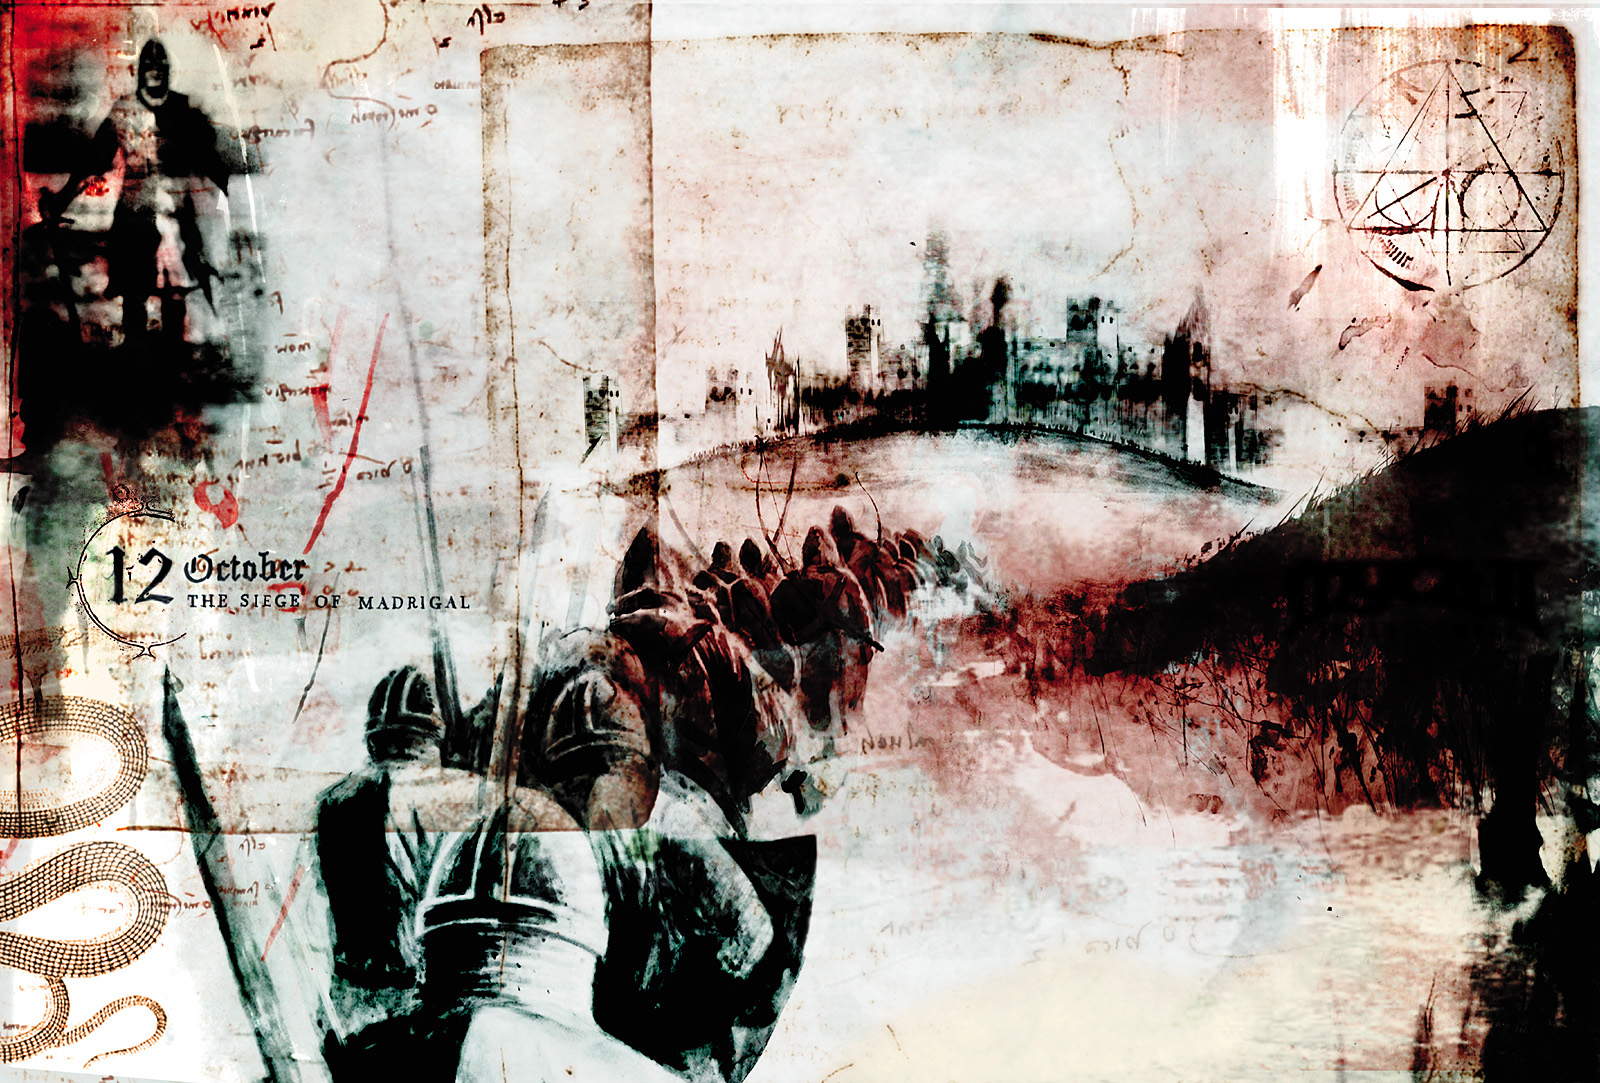 medieval computer wallpapers desktop backgrounds